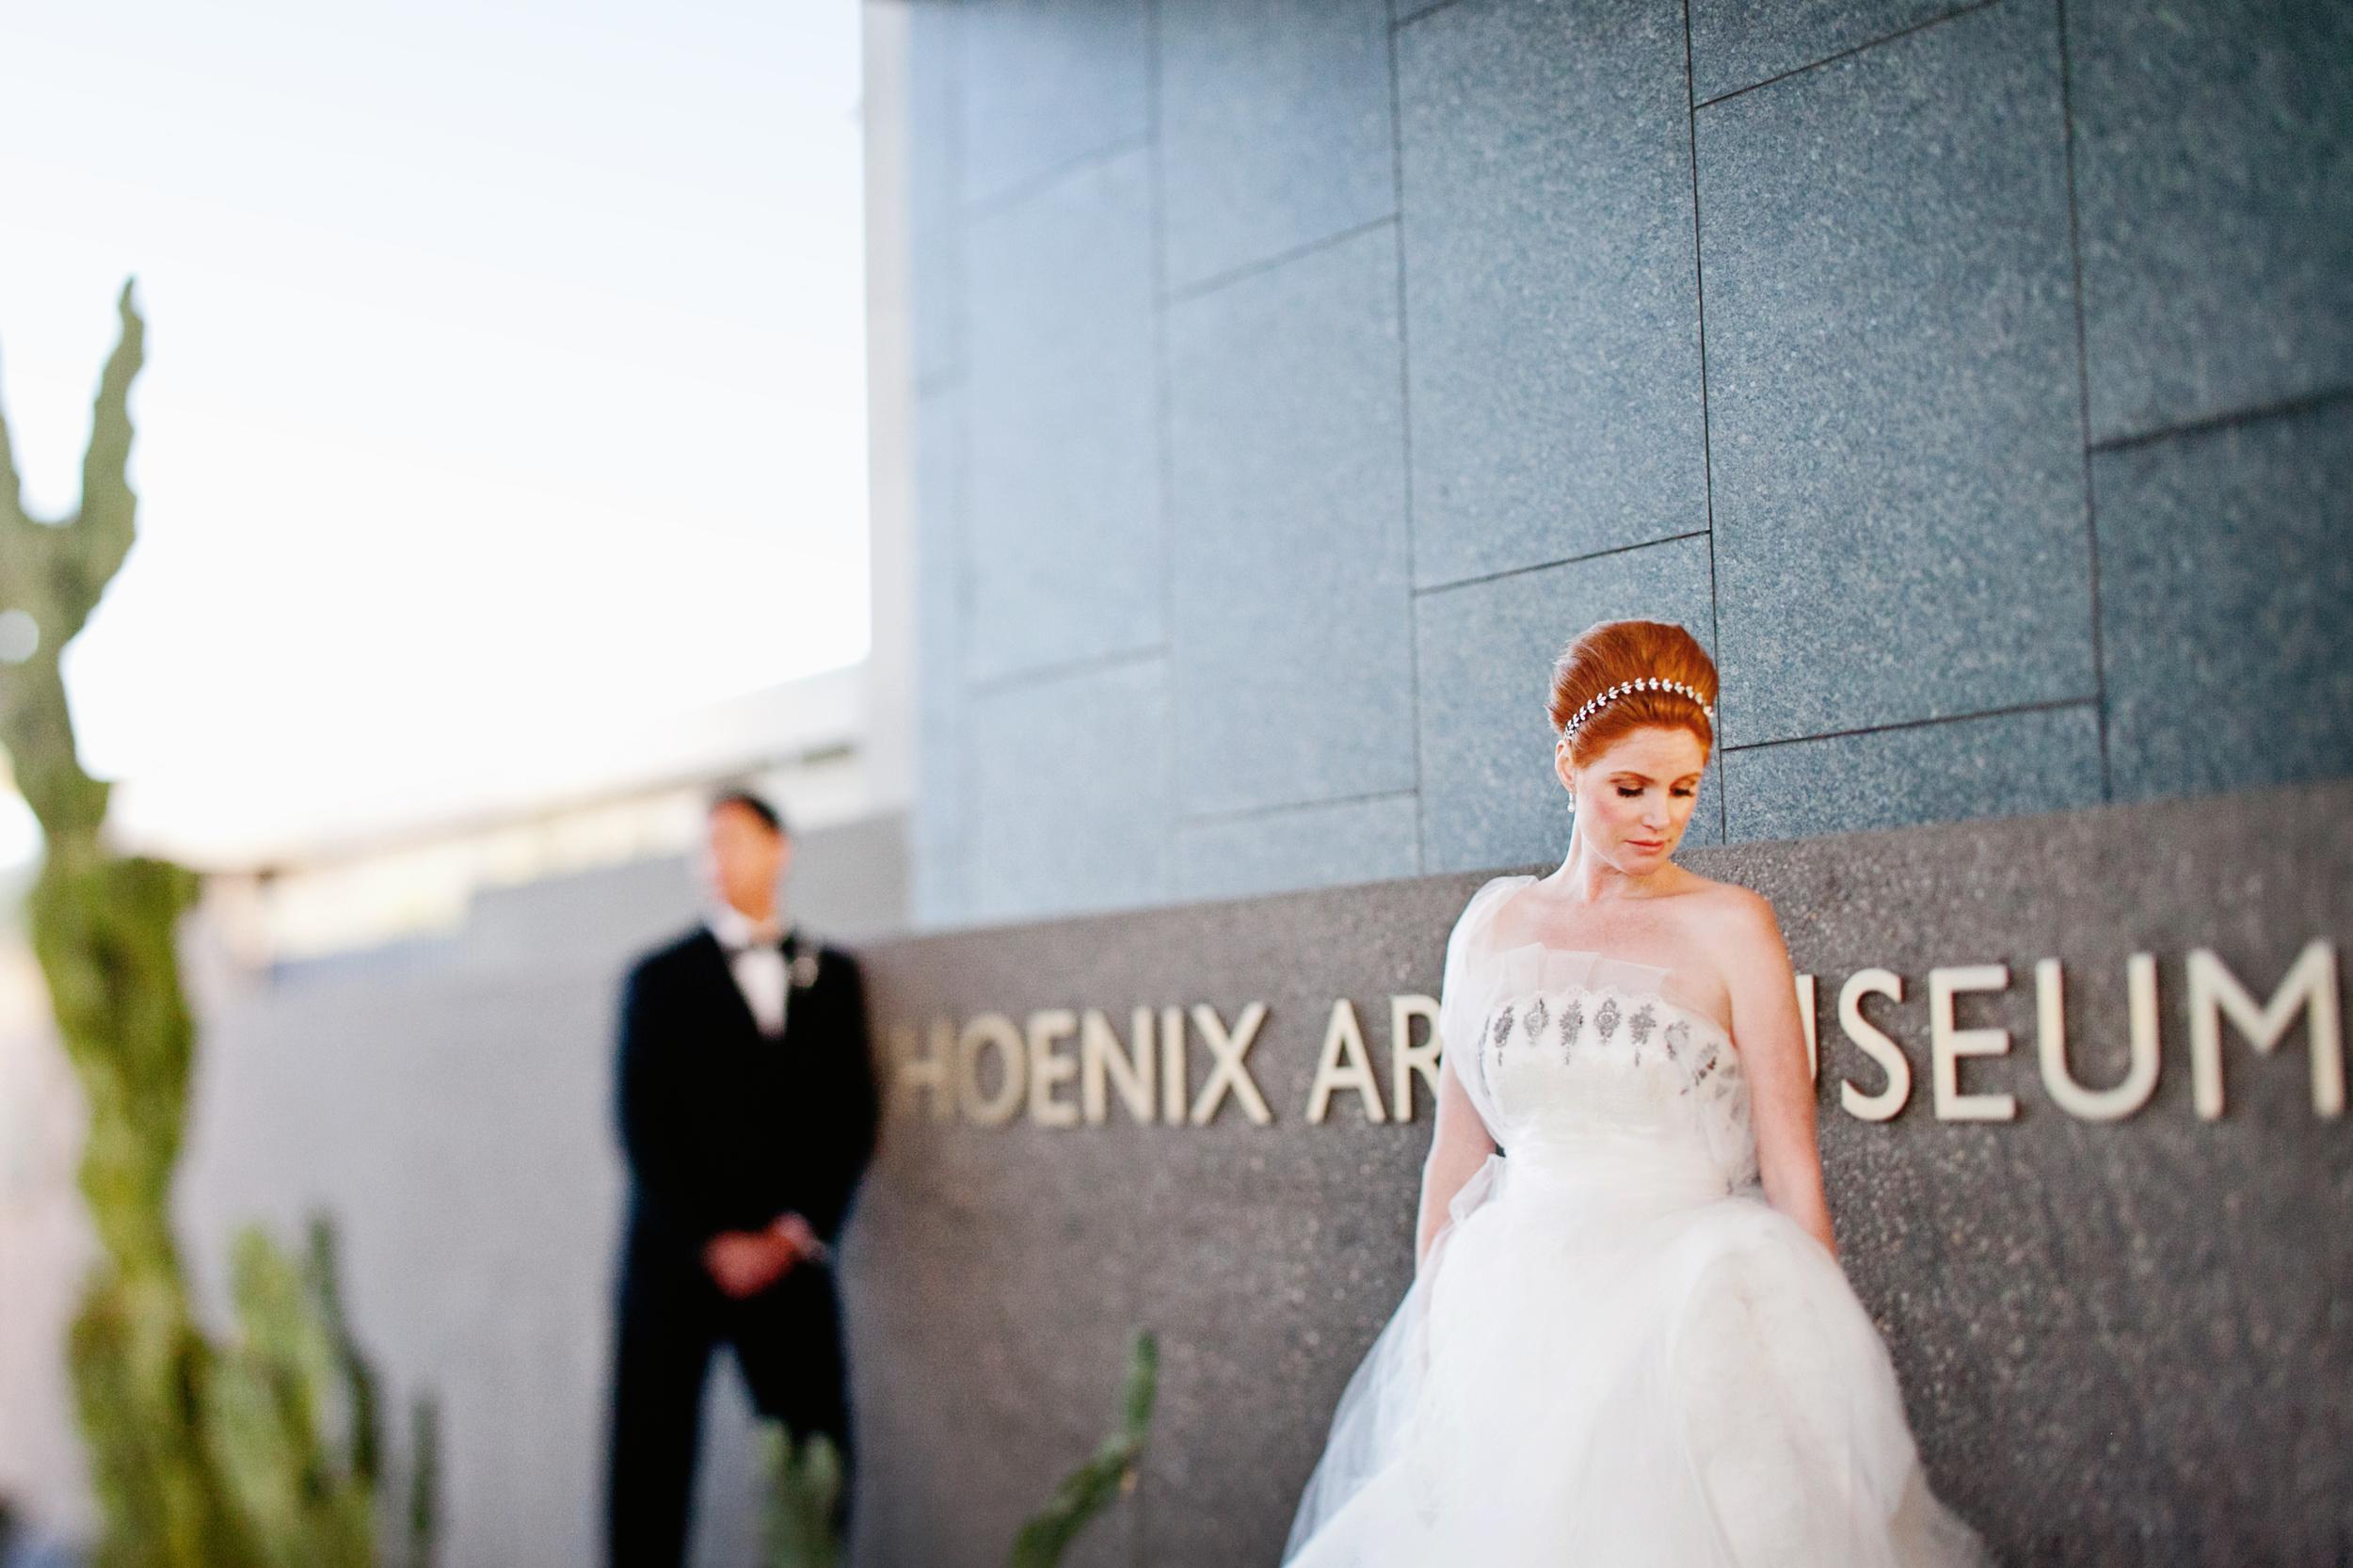 Phoenix_Art_Museum_Wedding-14.JPG